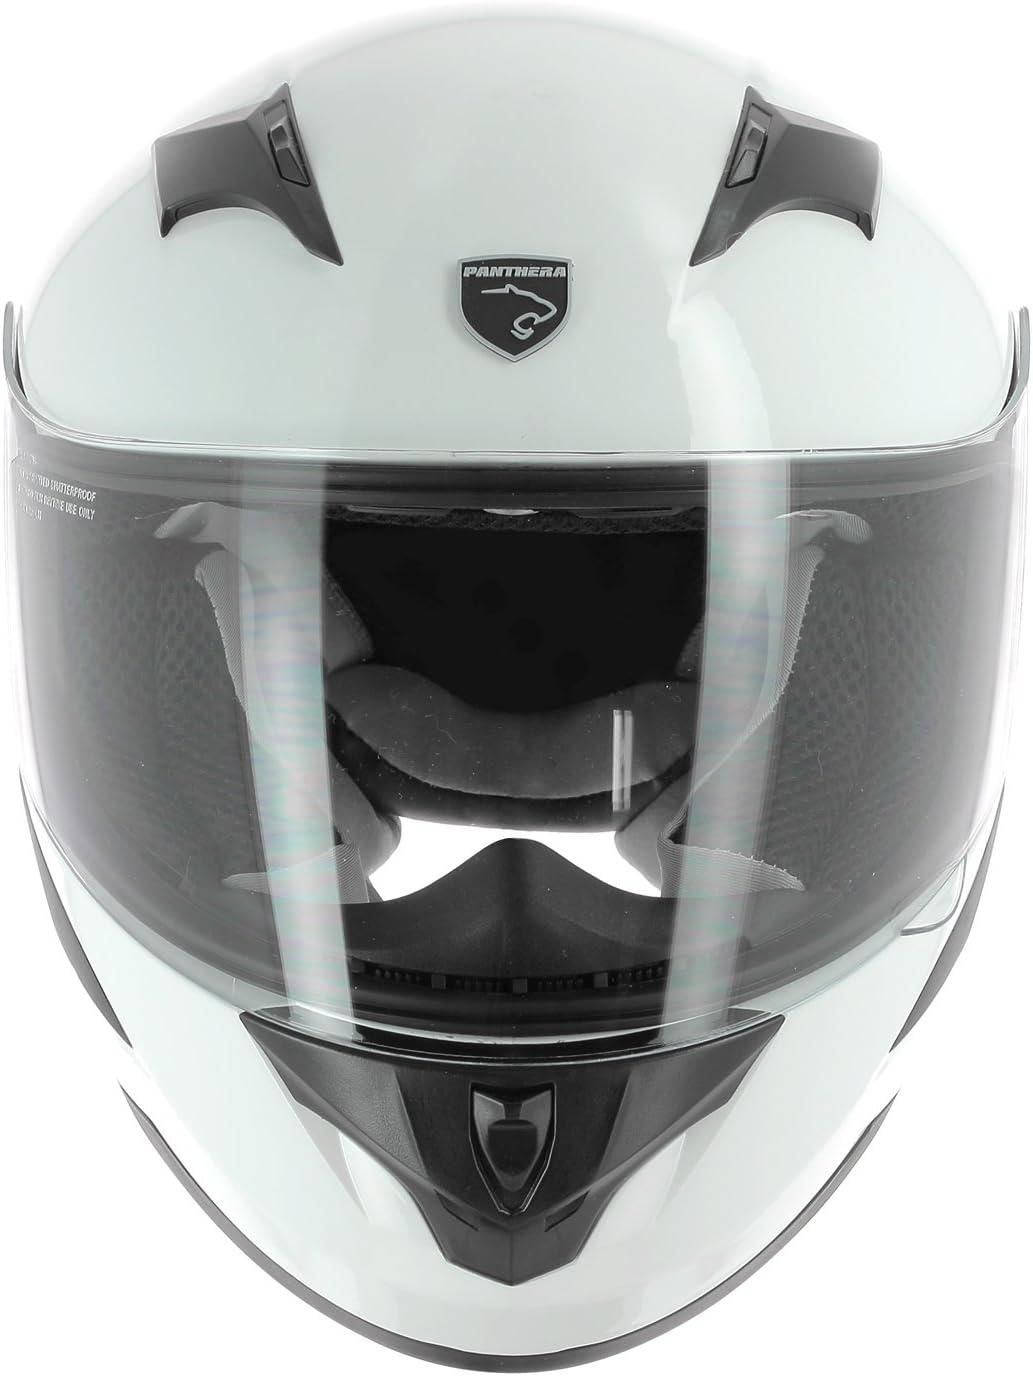 Taille S Blanc PANTHERA Casque Moto Int/égral Enfant Rooky